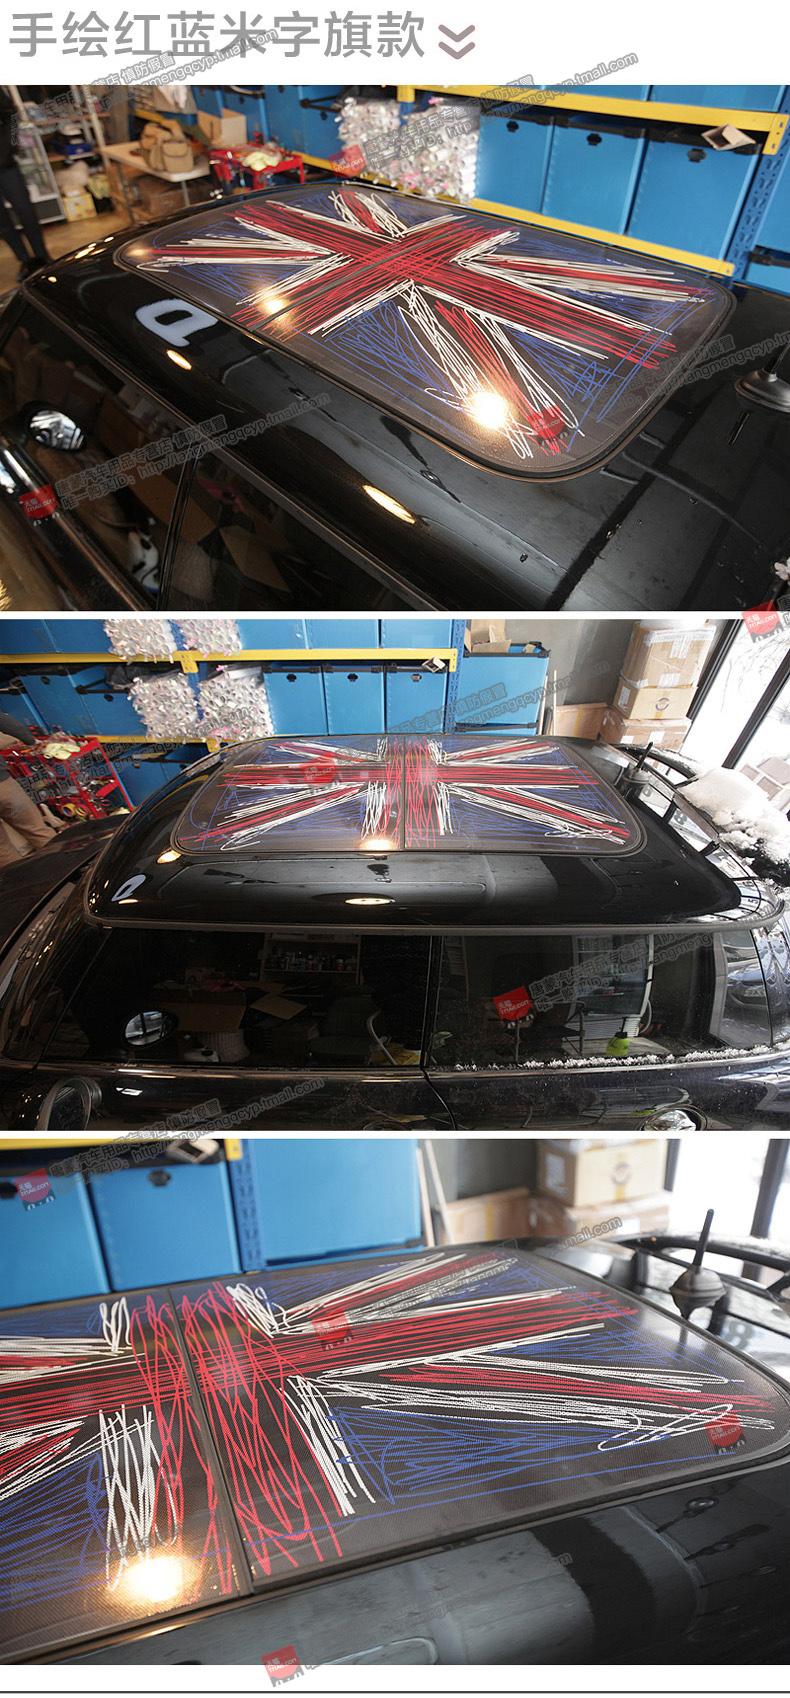 BMW寶馬迷你mini車貼車頂天窗貼紙one cooper F55 F56 countryman